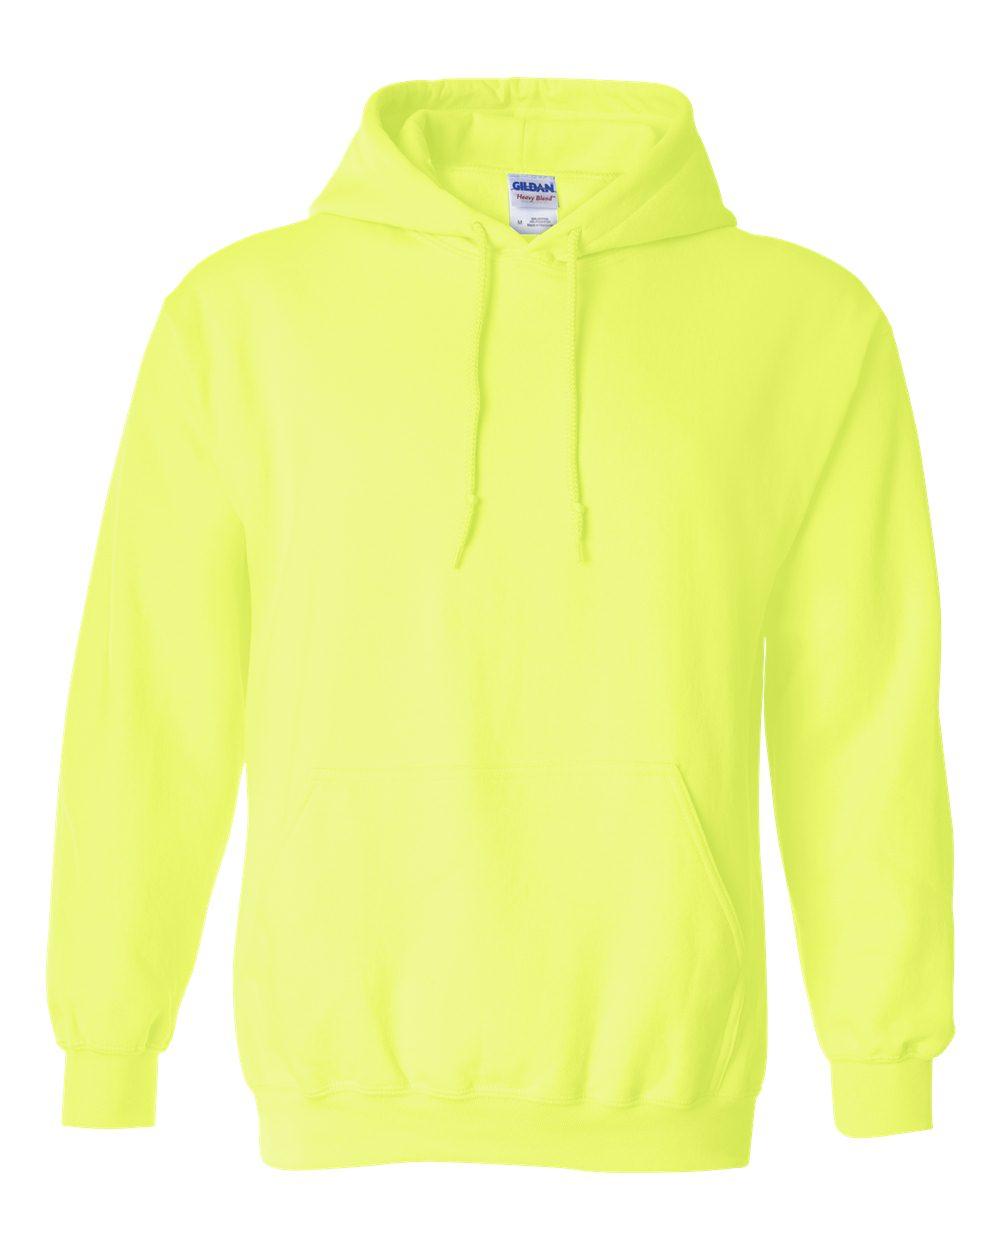 Picture of Gildan Heavyweight Blend 50/50 Hooded Sweatshirt